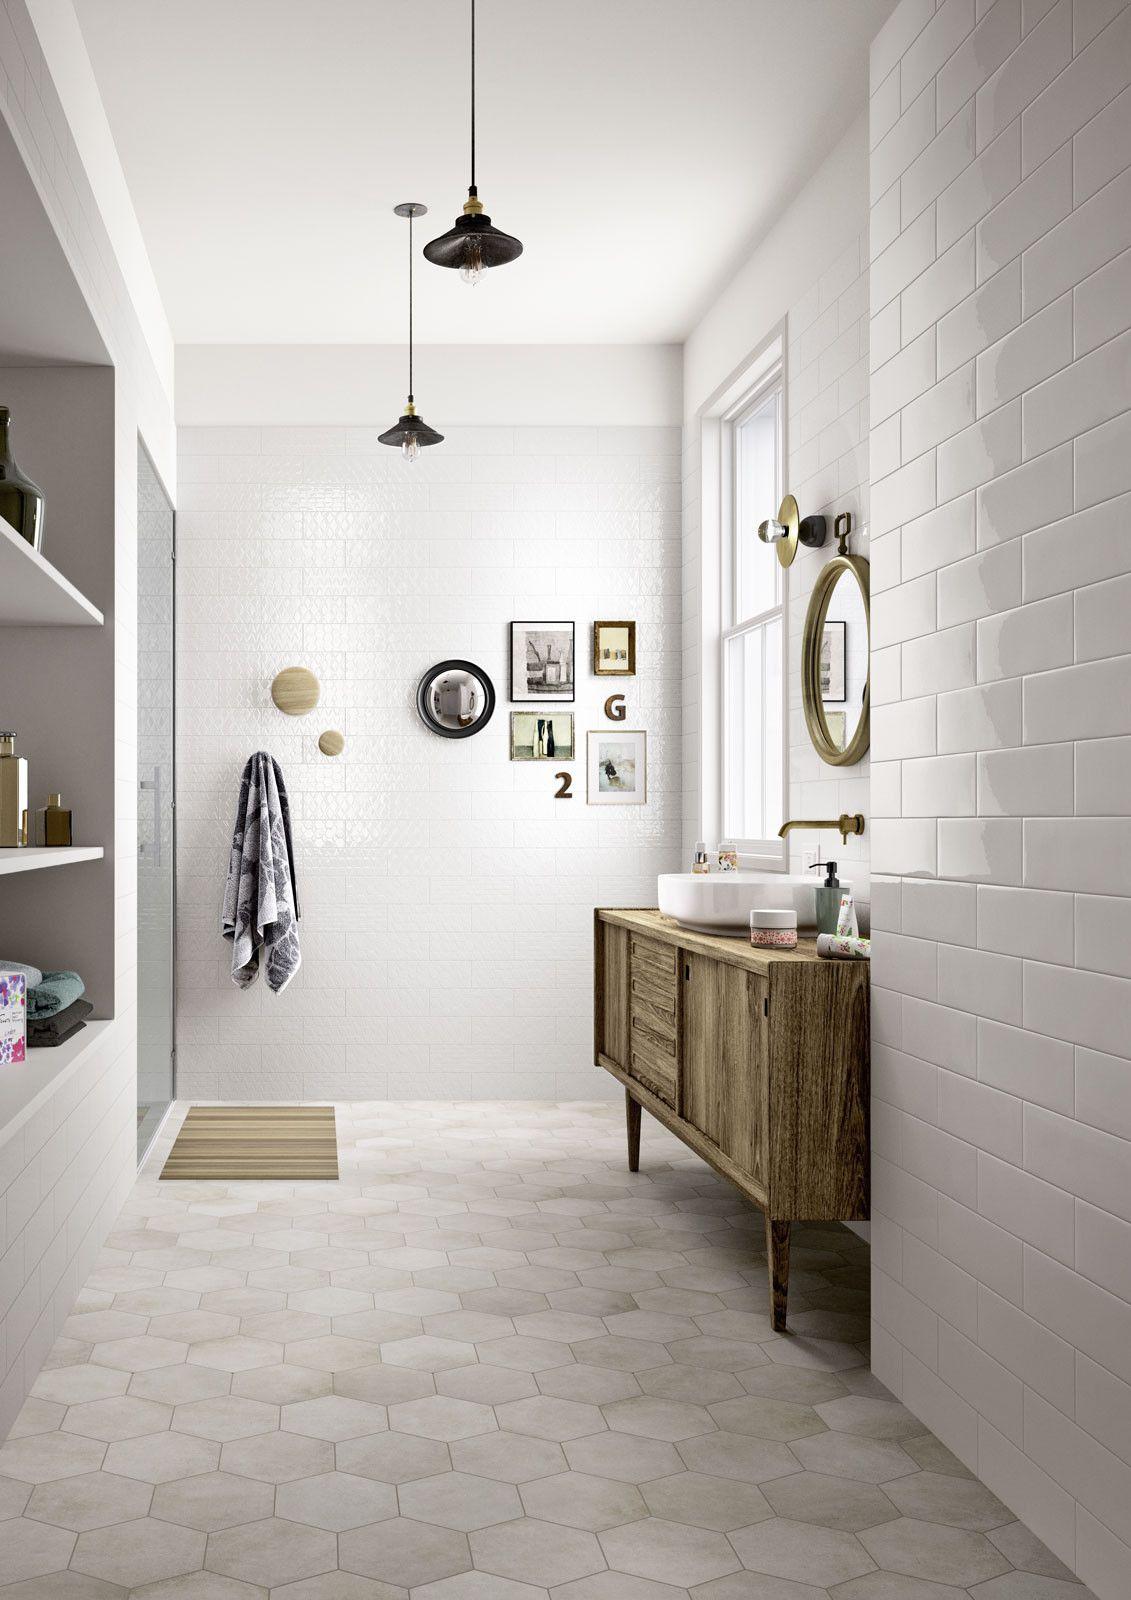 Marazzi Mellow Dekor Sugar 10x30 Cm Mmn3 Bad Inspiration Badezimmer Wasche Bodenbelag Fur Badezimmer